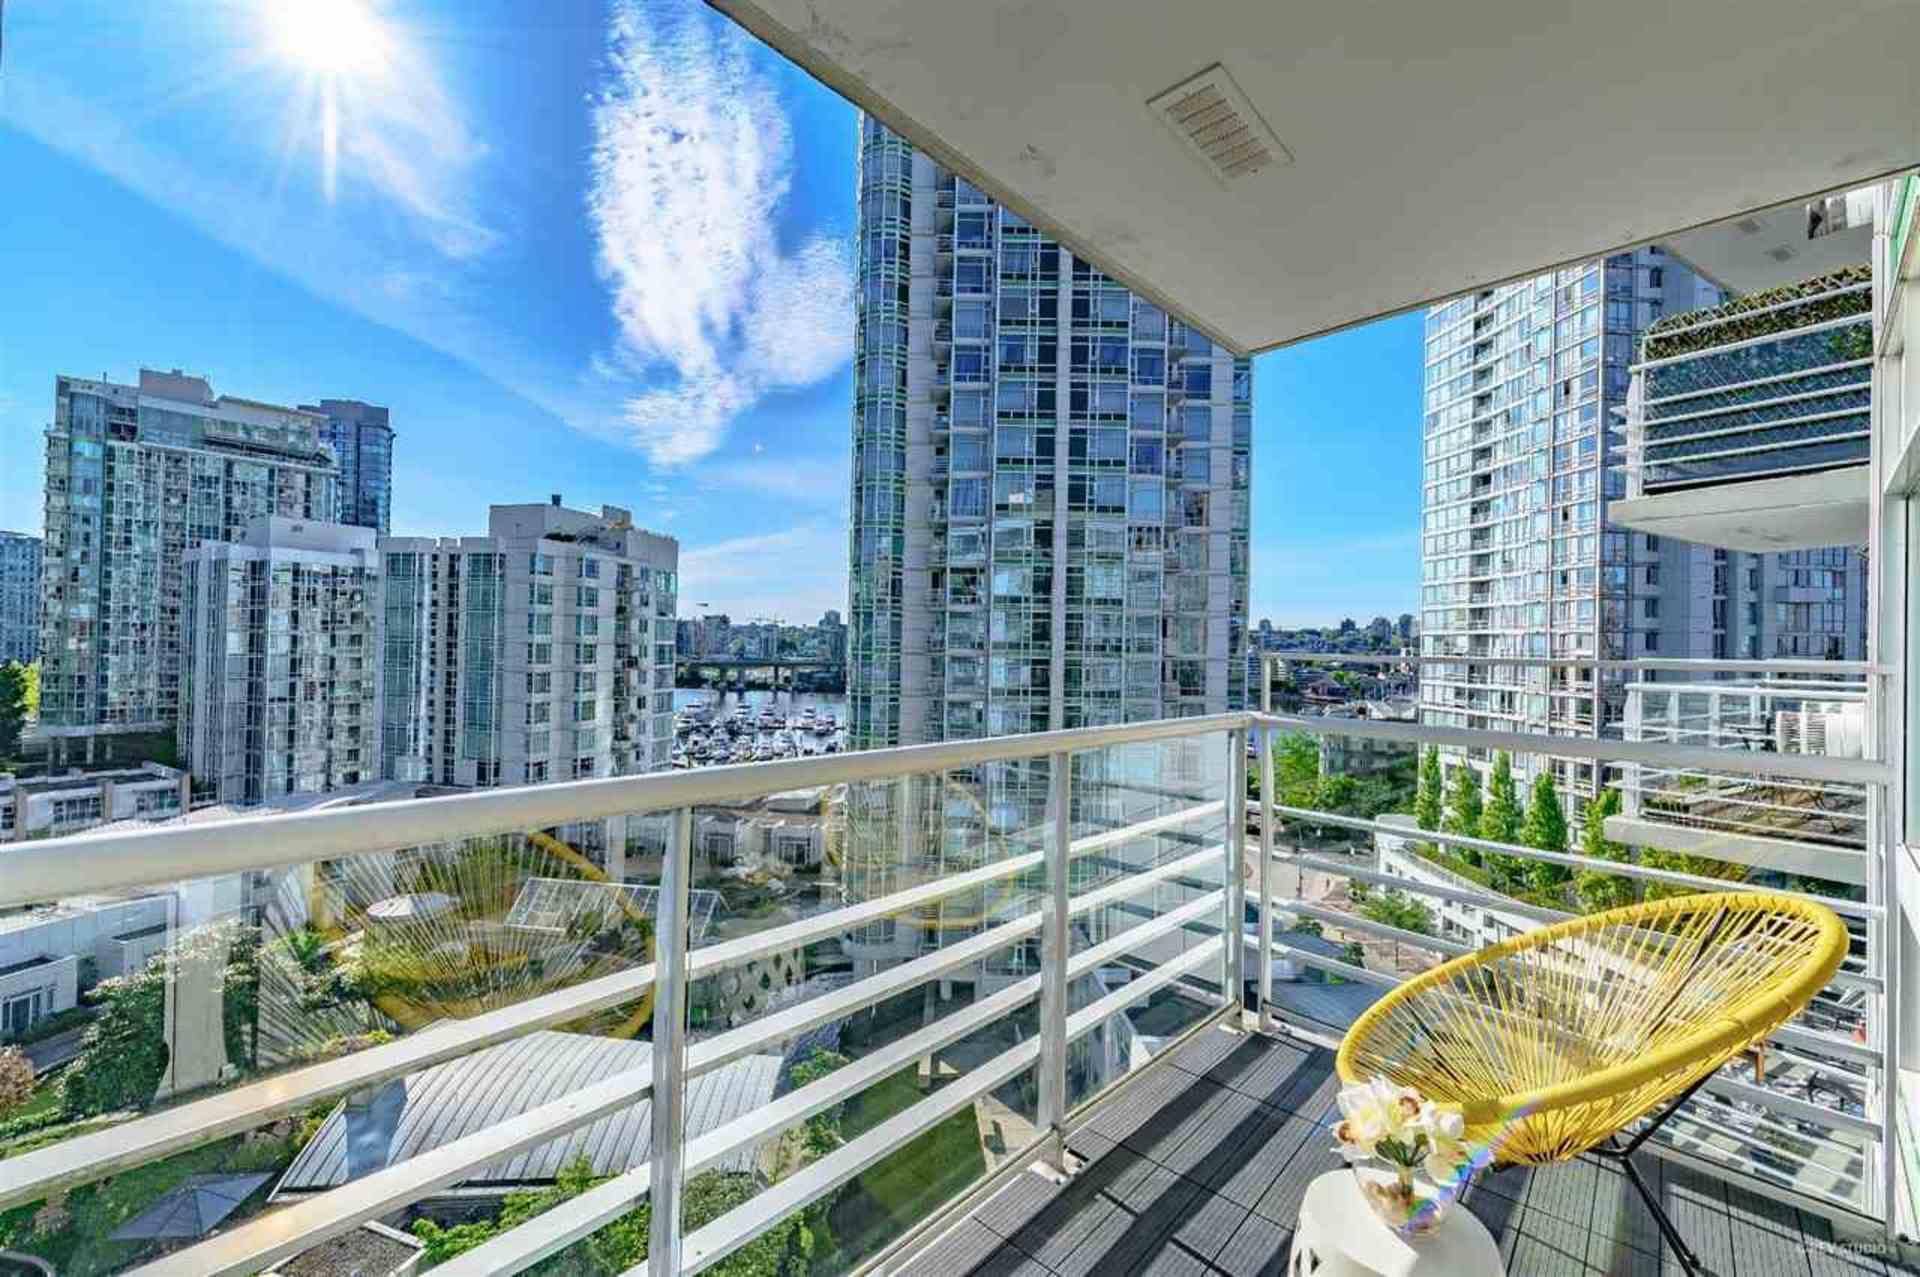 189-davie-street-yaletown-vancouver-west-03 at 1105 - 189 Davie Street, Yaletown, Vancouver West